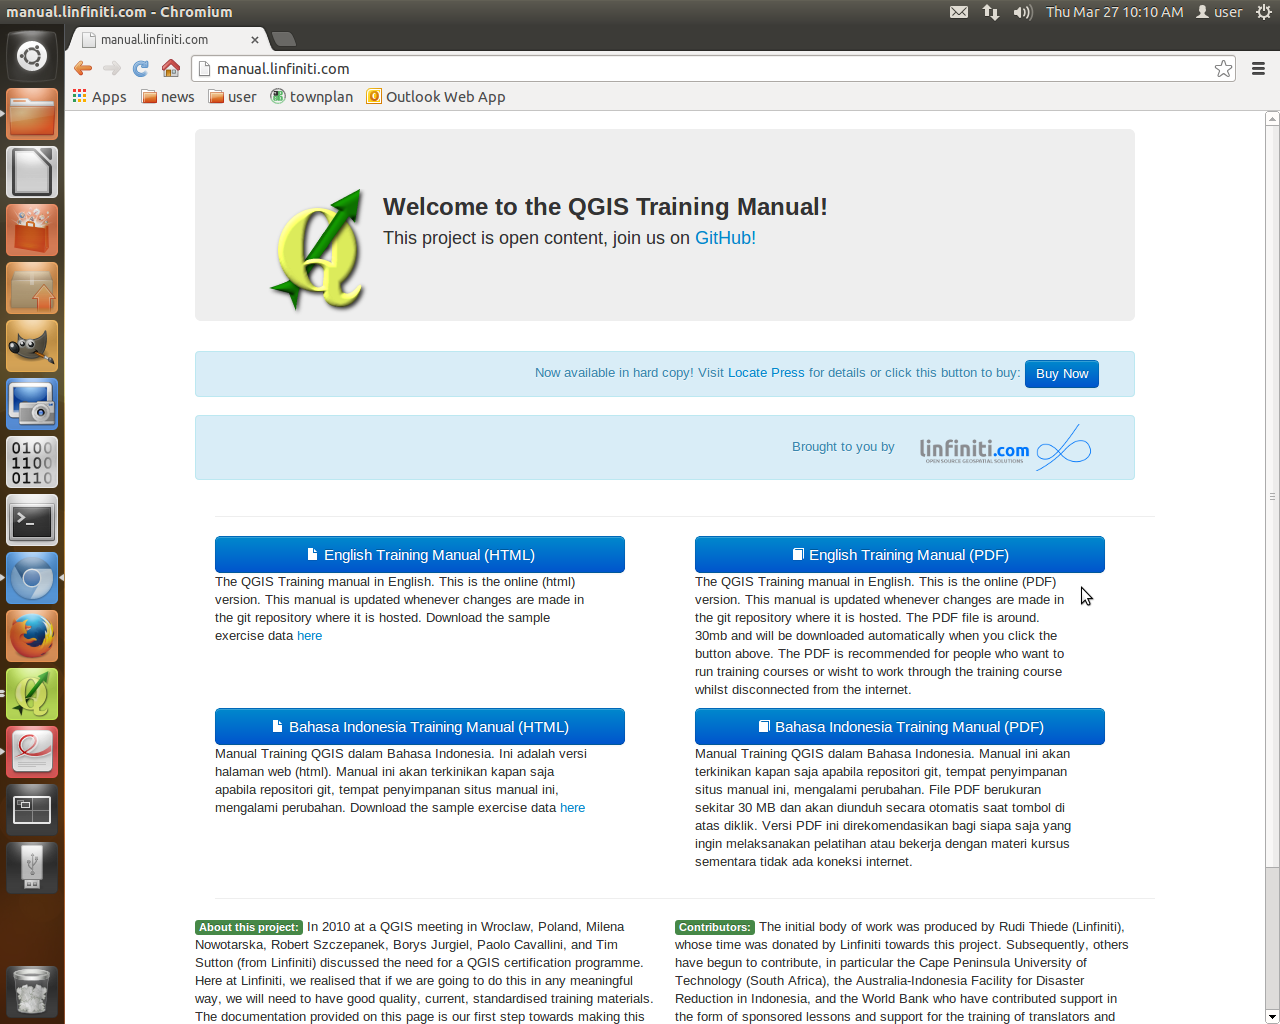 QGIS MALAYSIA: Quantum GIS Training Manual